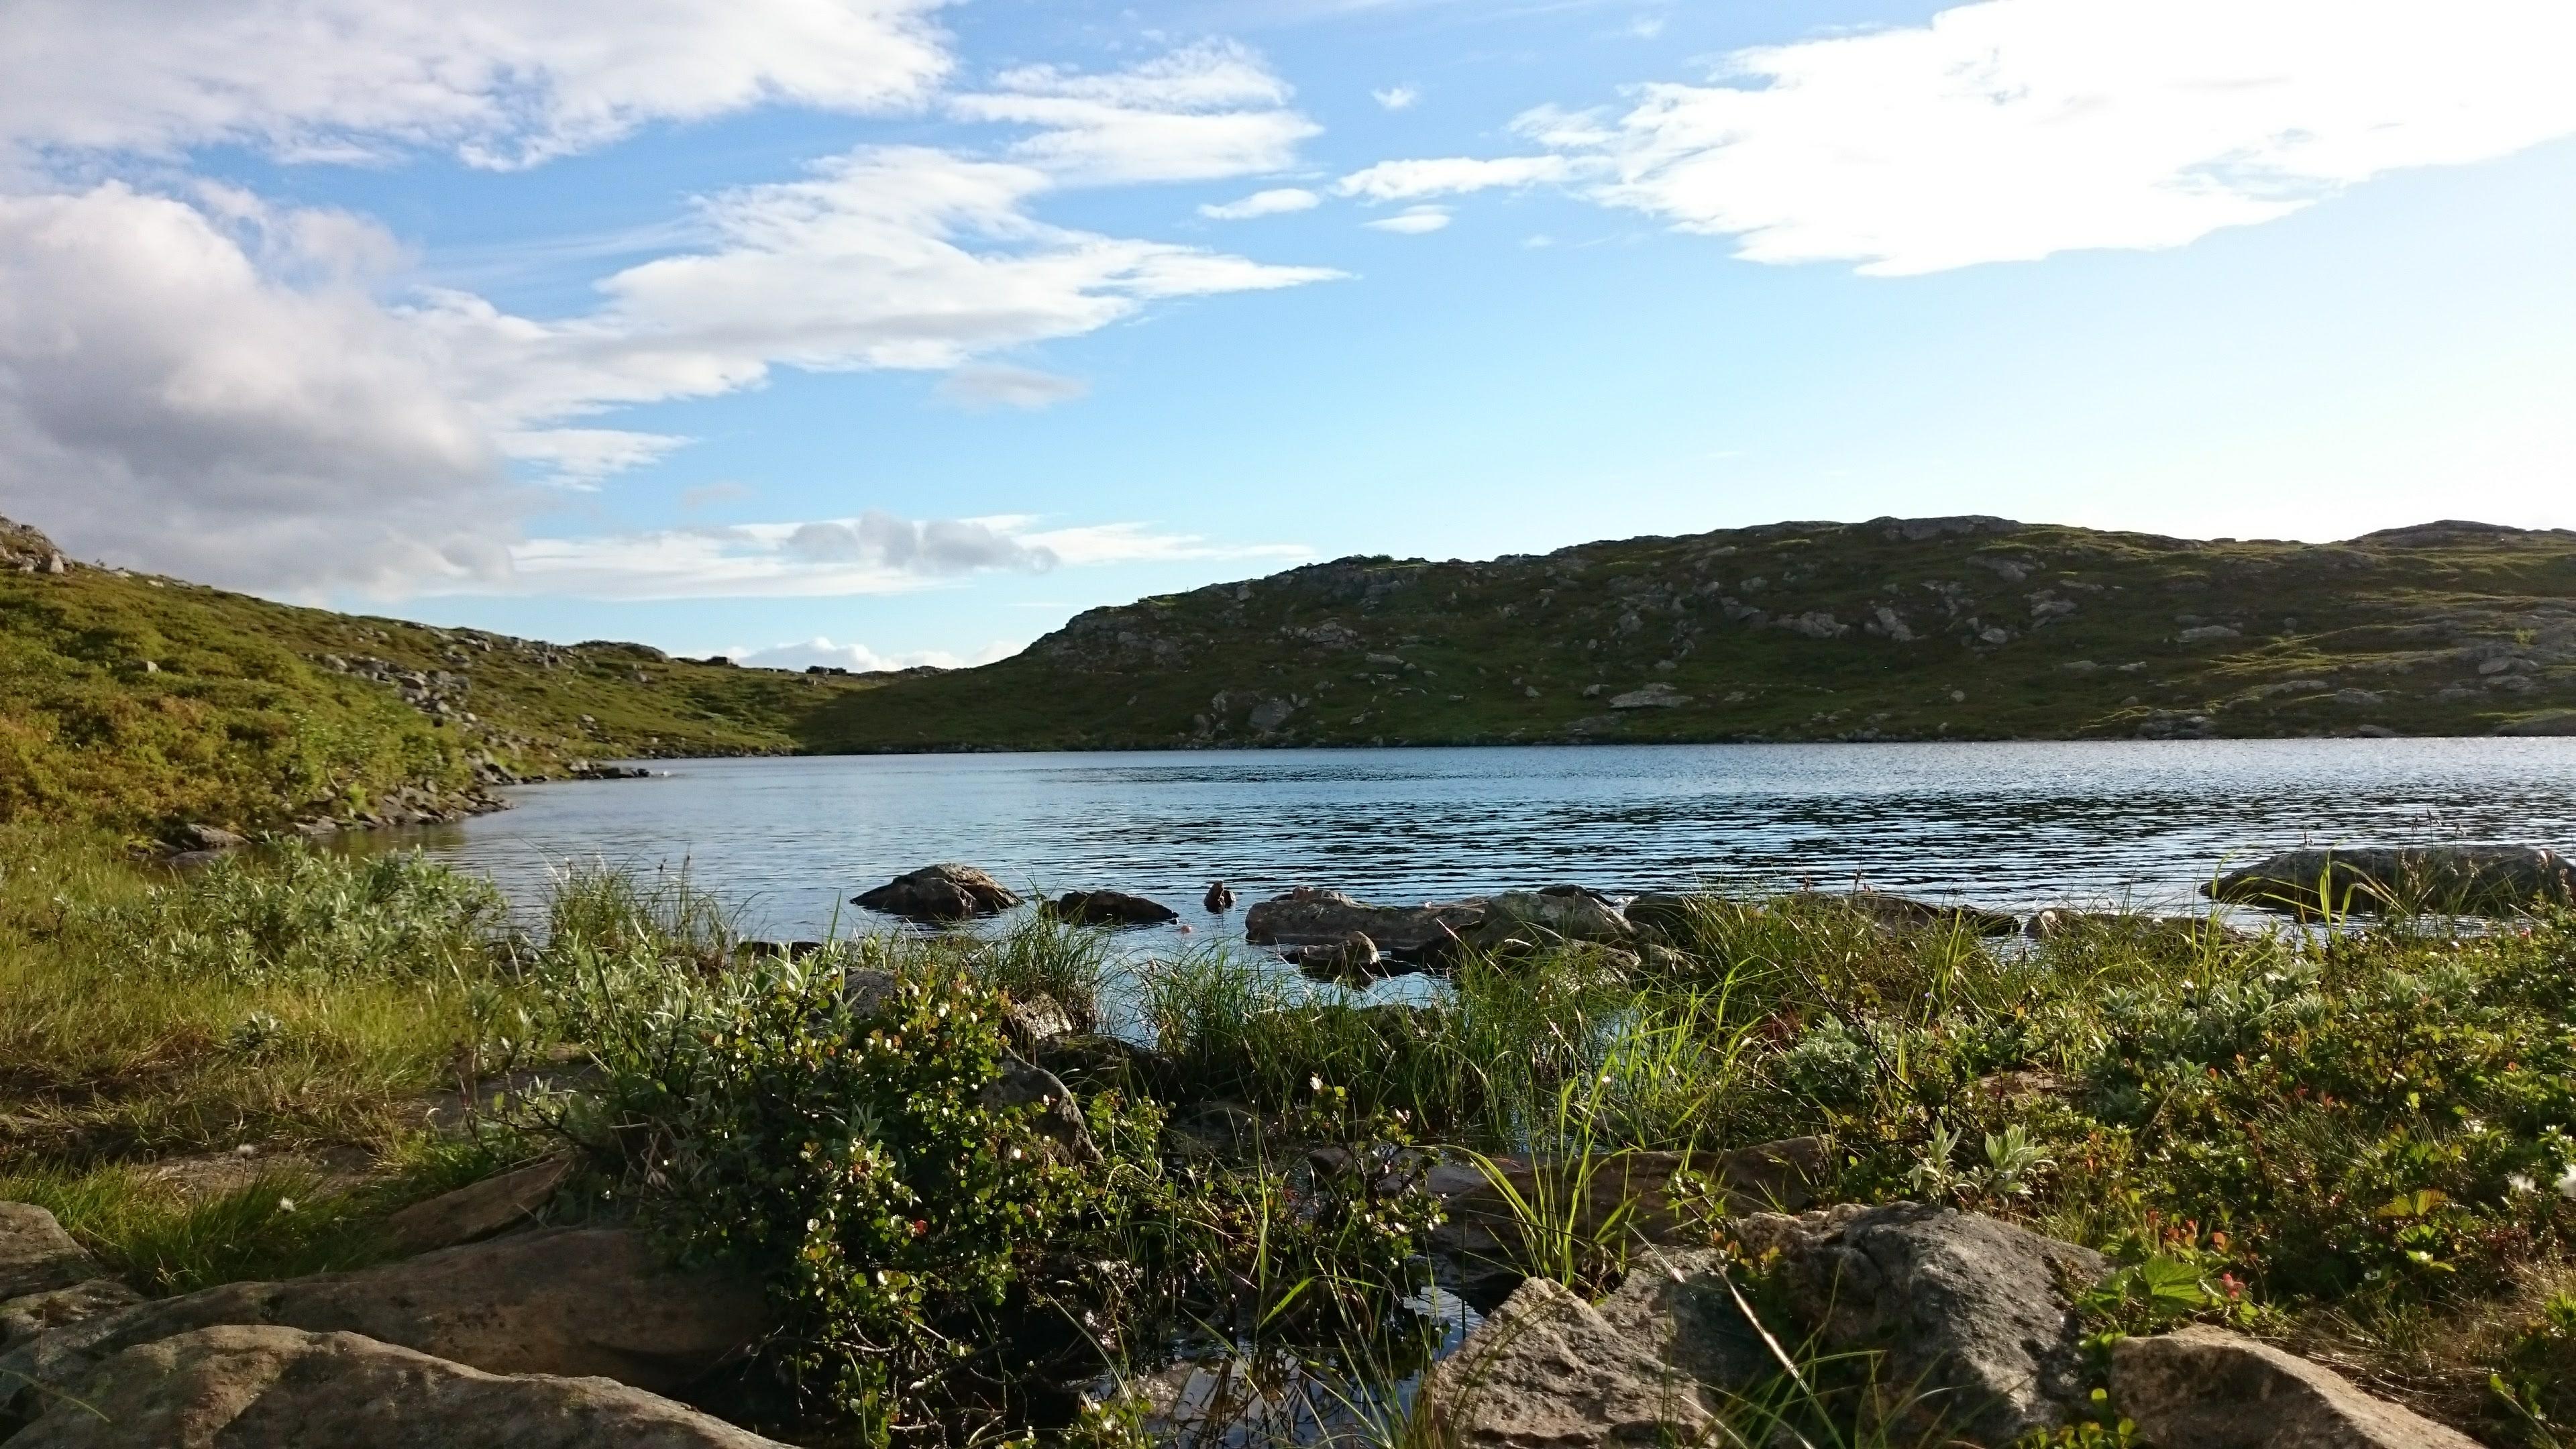 U jezera Keipvatnen